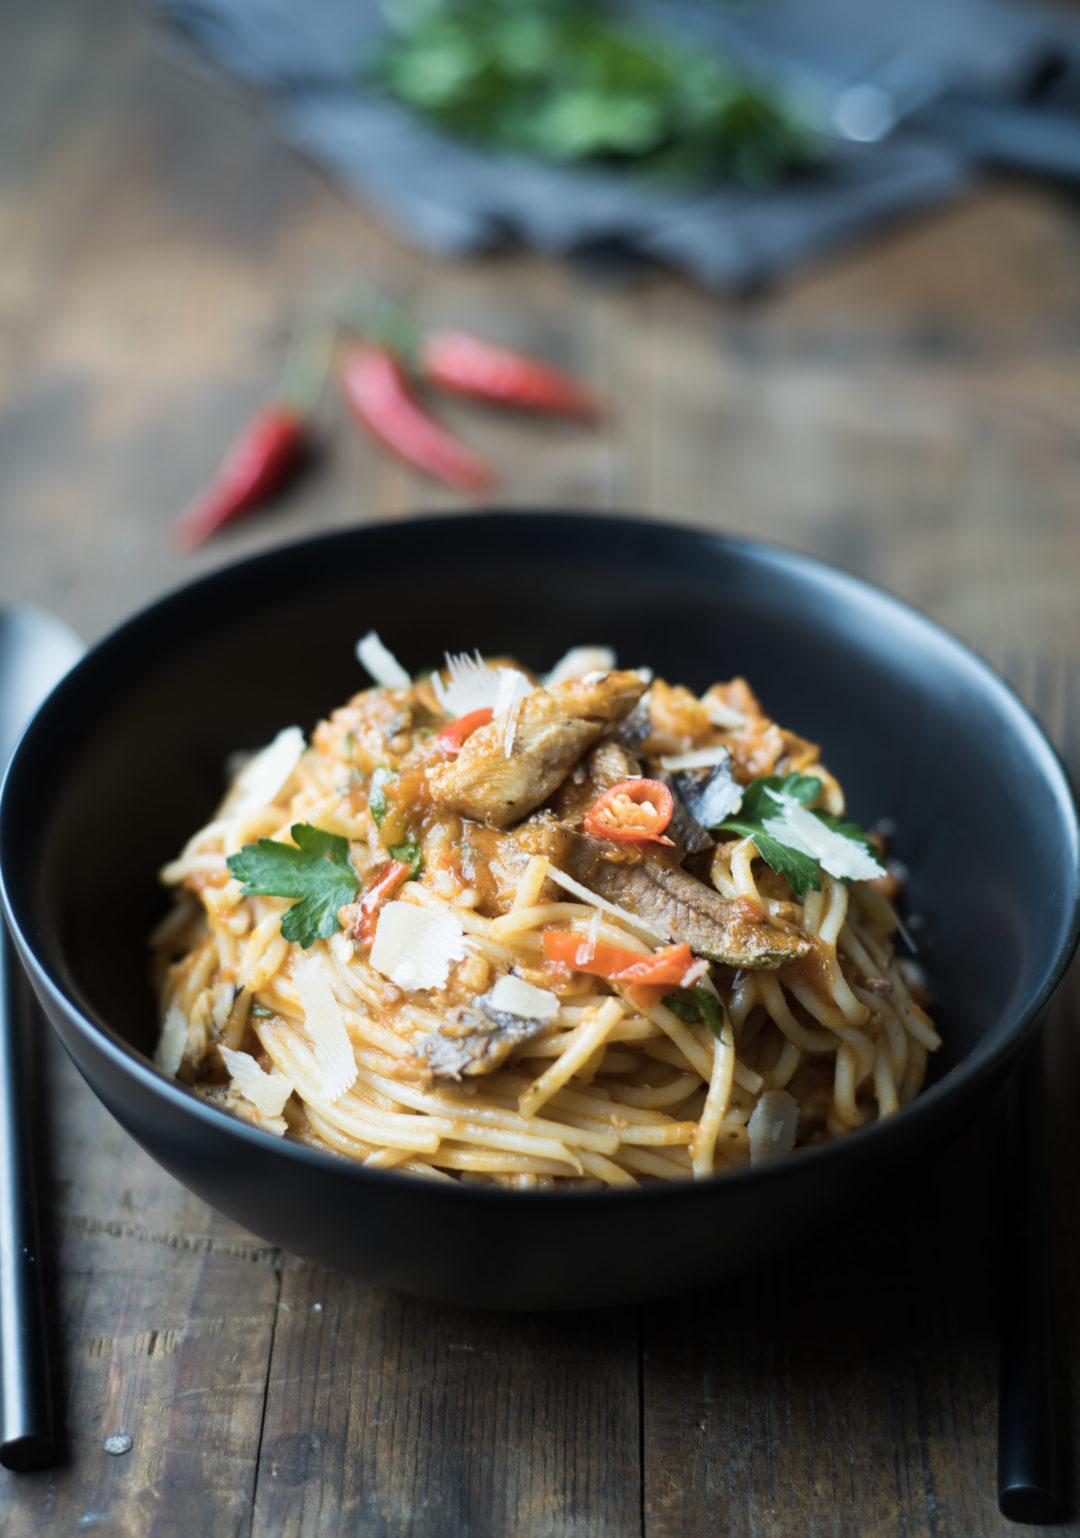 spaghettis ail tomate sardine persil cuisine tunisienne piment harissa